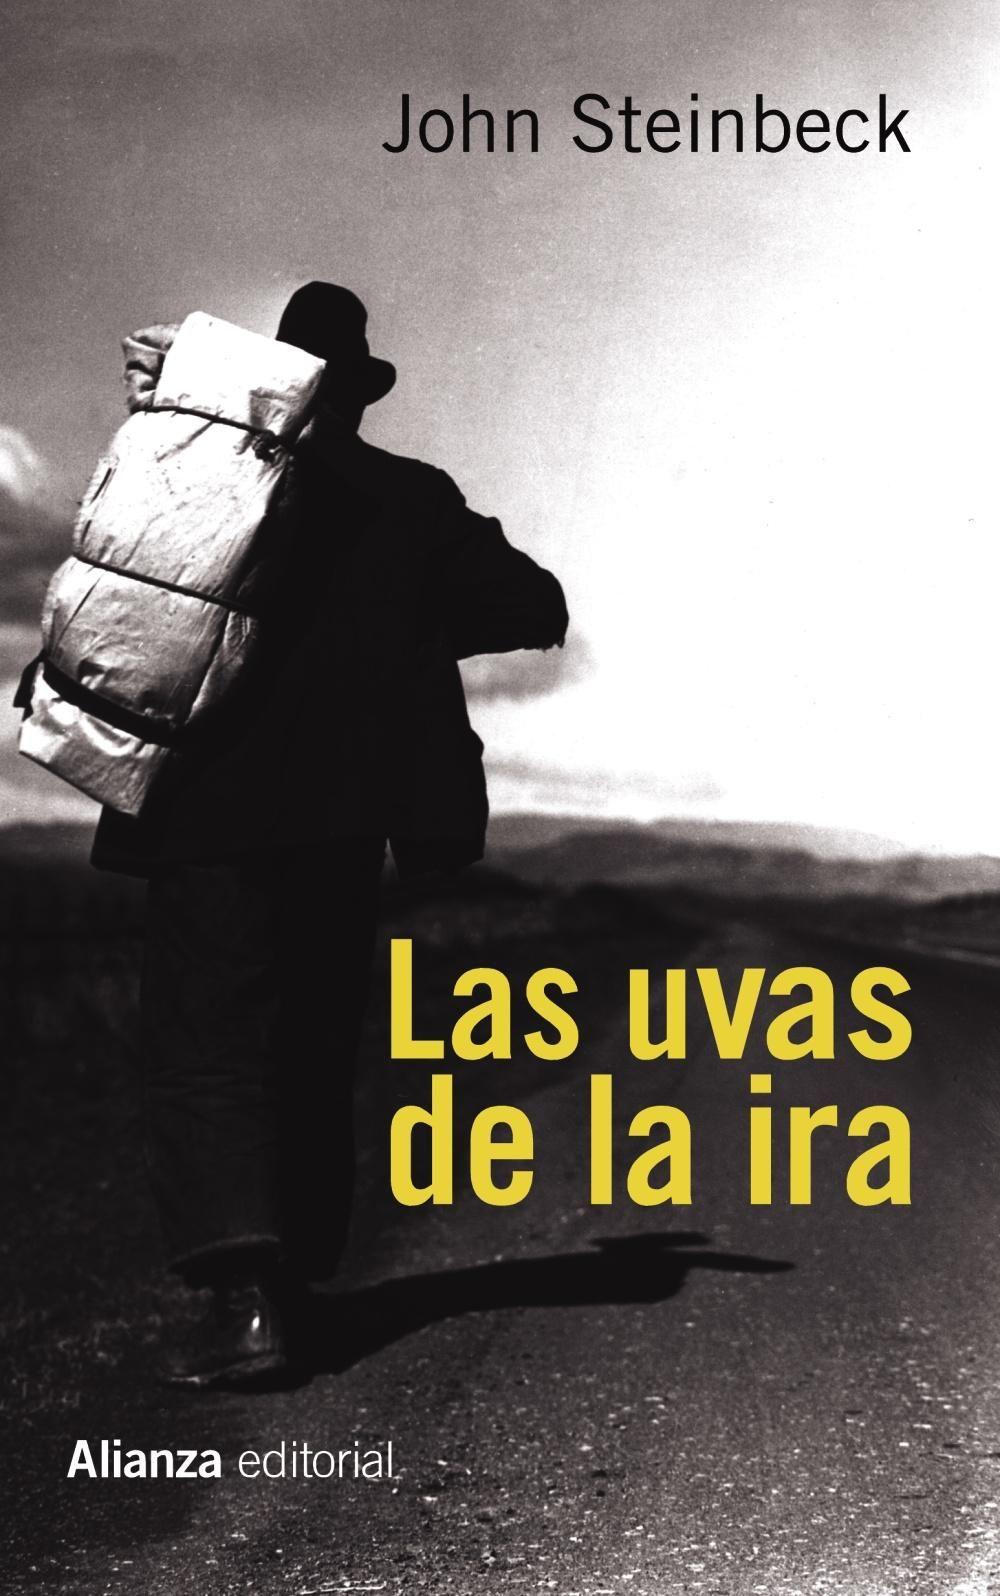 89 Ideas De Cine Musica Libros Cine Musica Libros Cine Musica